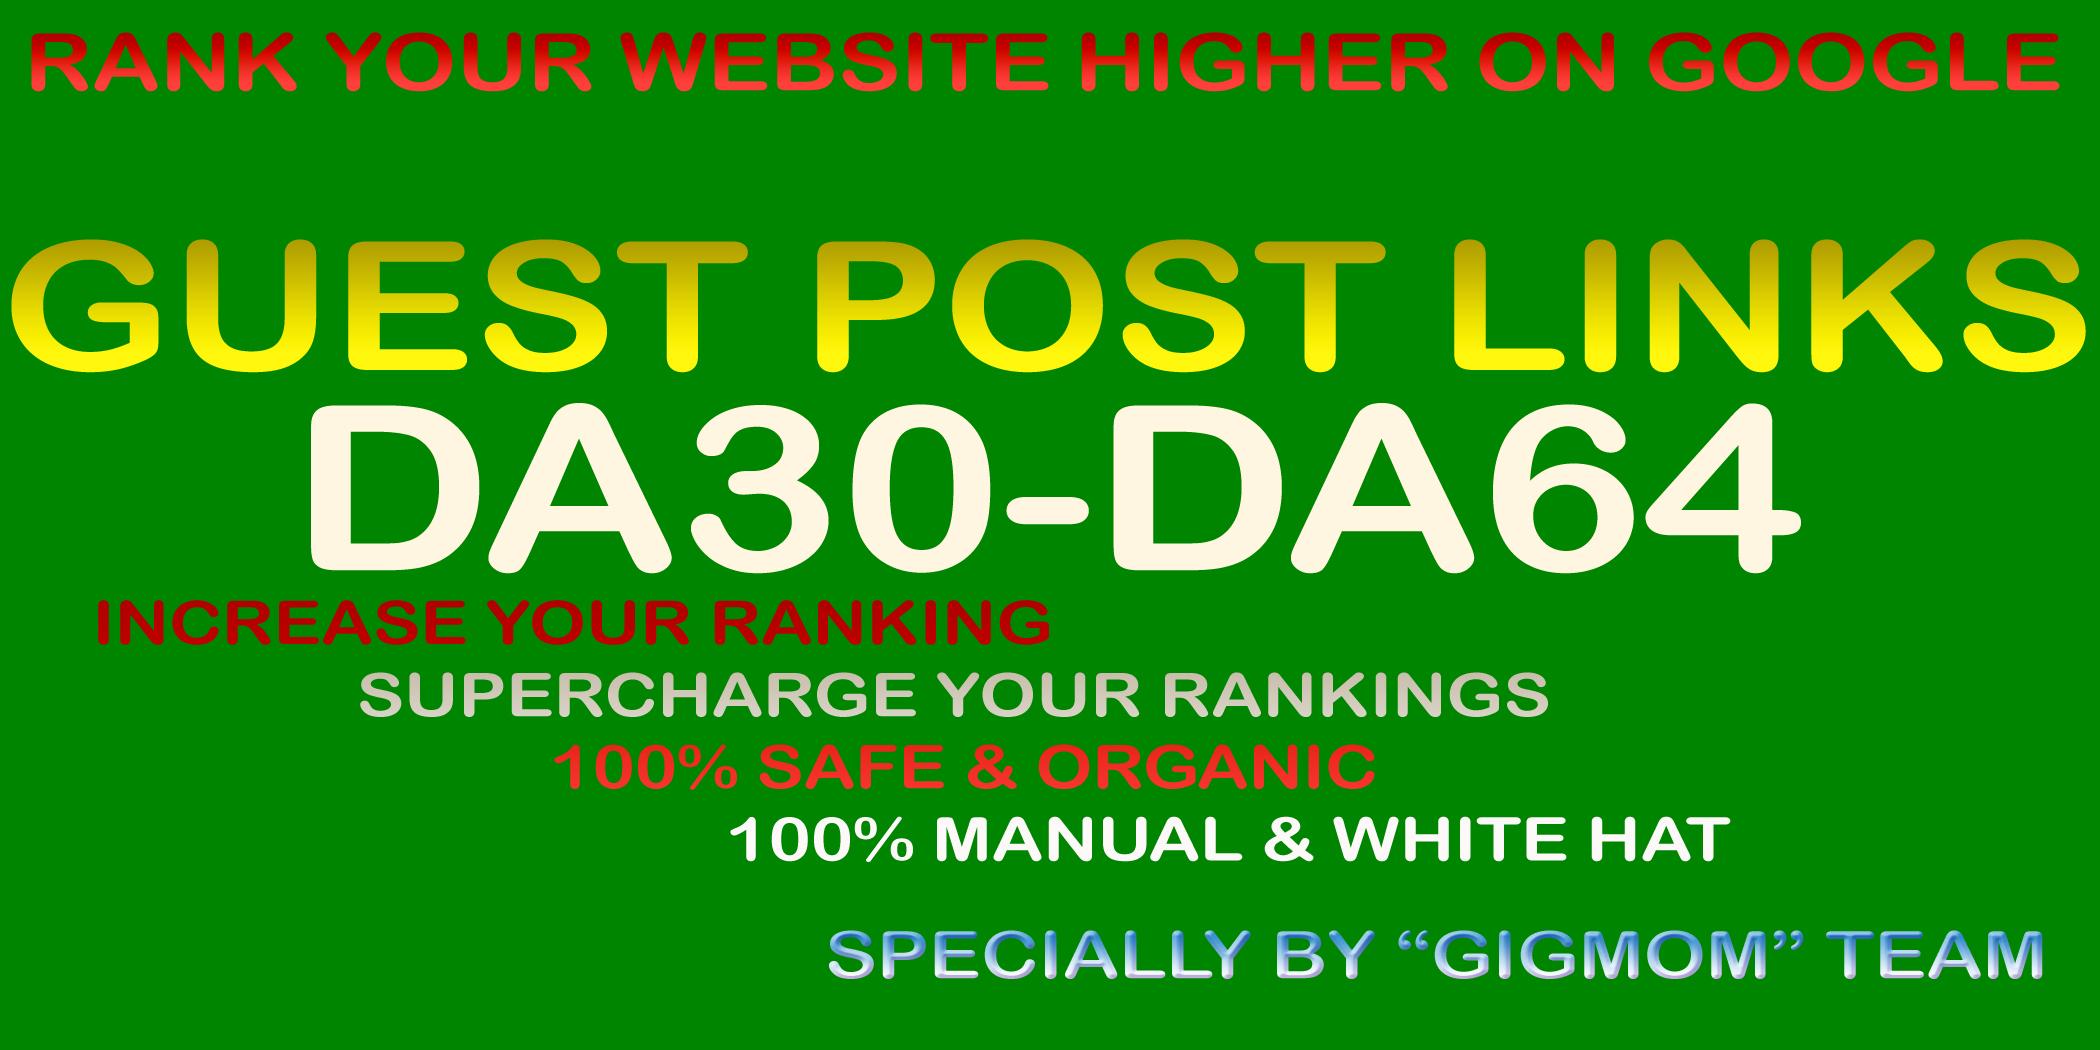 9 Guest Post Links DA30-DA64 High Visitor Blogs to Rank Higher